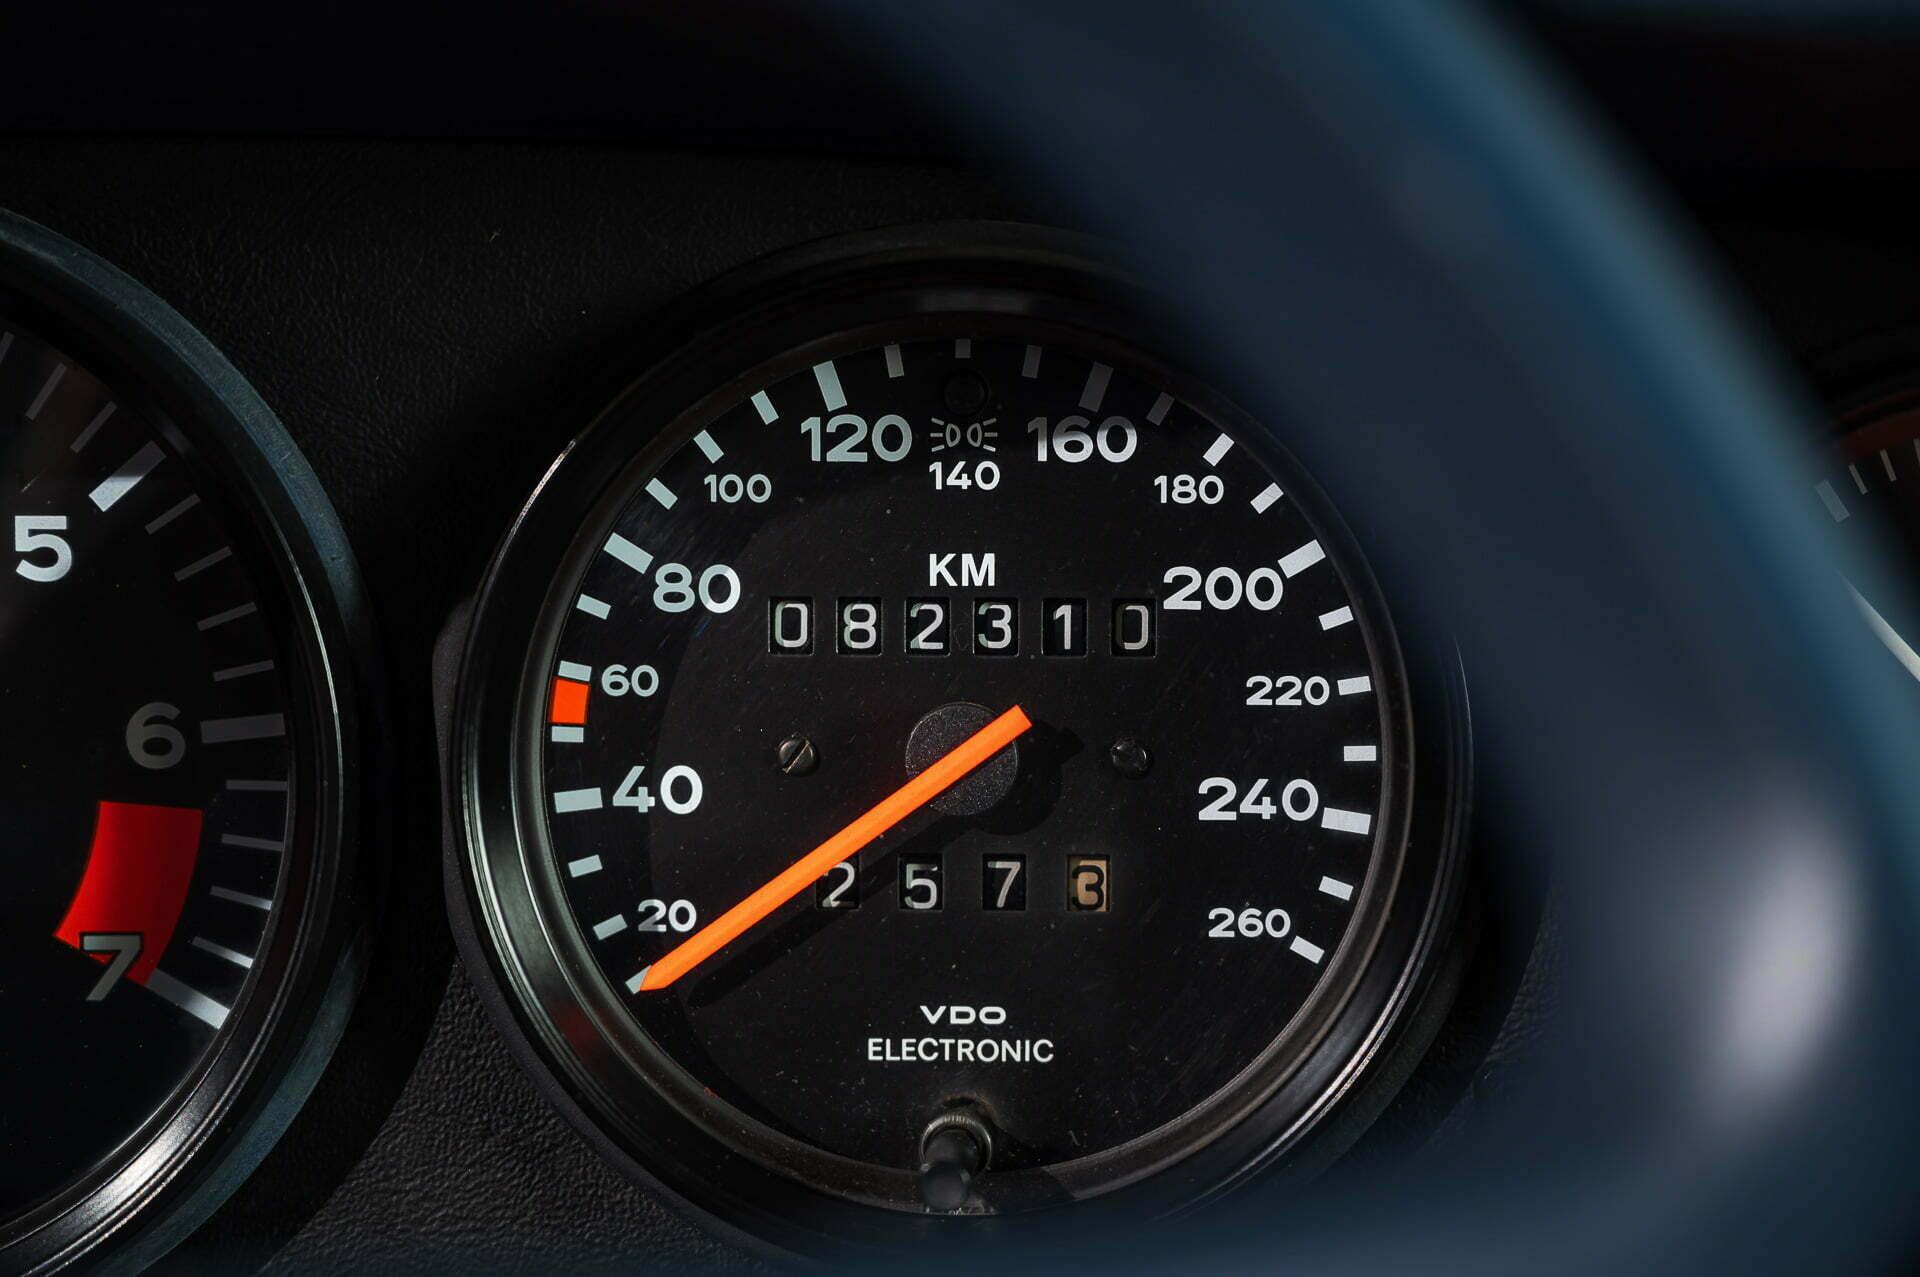 PORSCHE 911 3.2 PRUISSISCH BLAUW HANDGESCHAKELD CAR SERVICE VISSER GESPECIALISEERD IN PORSCHE HILVERSUM